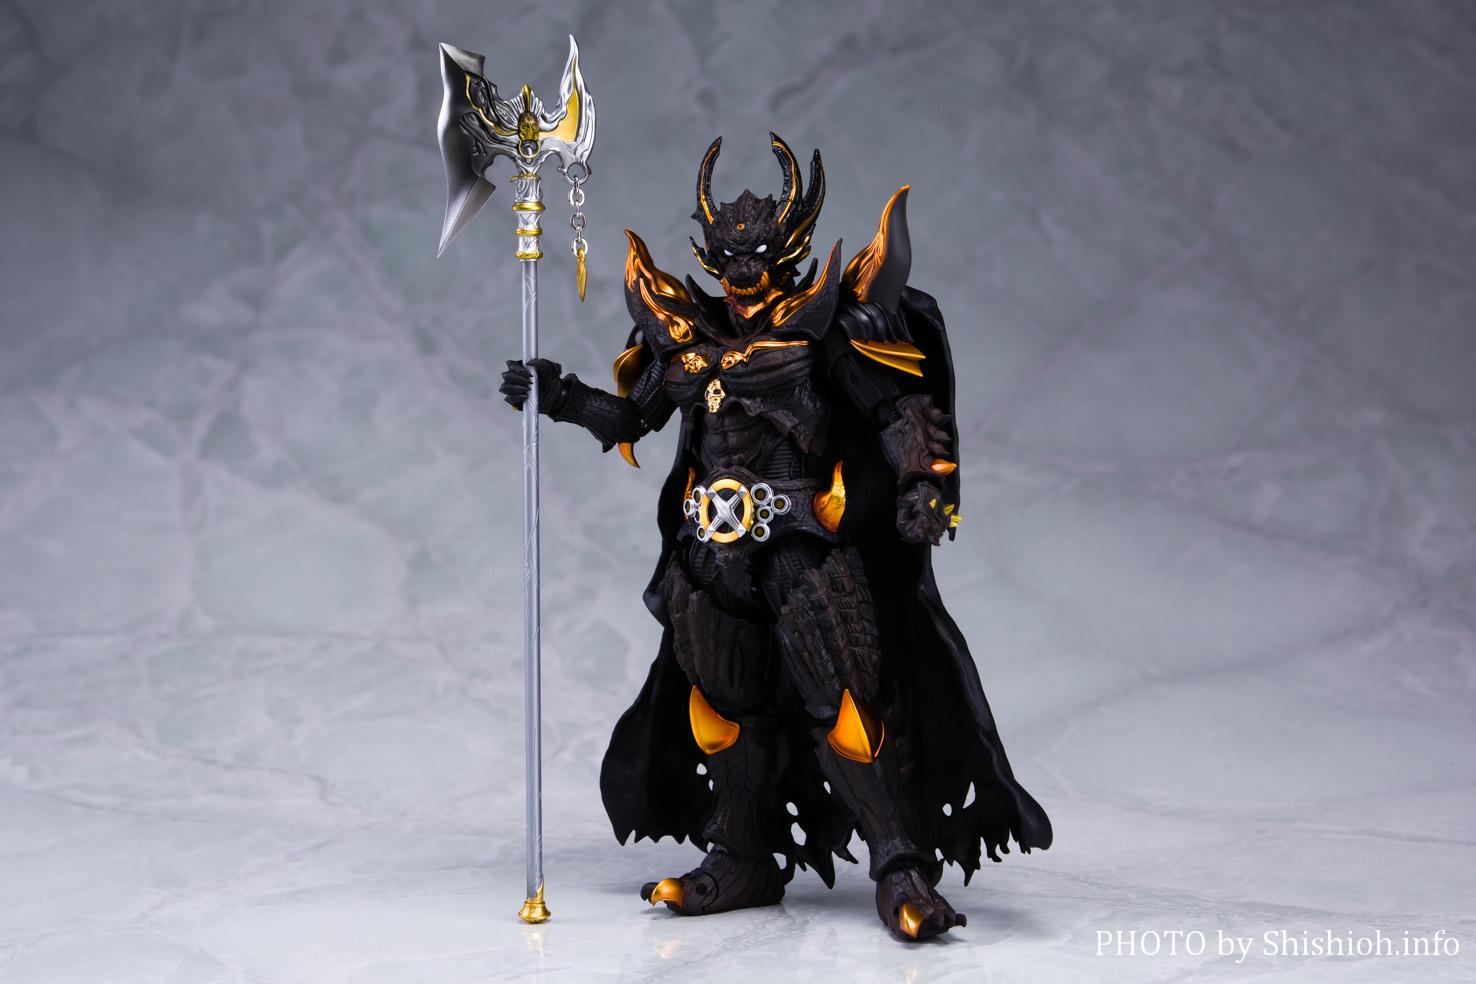 S.H.Figuarts(真骨彫製法) 暗黒騎士キバ